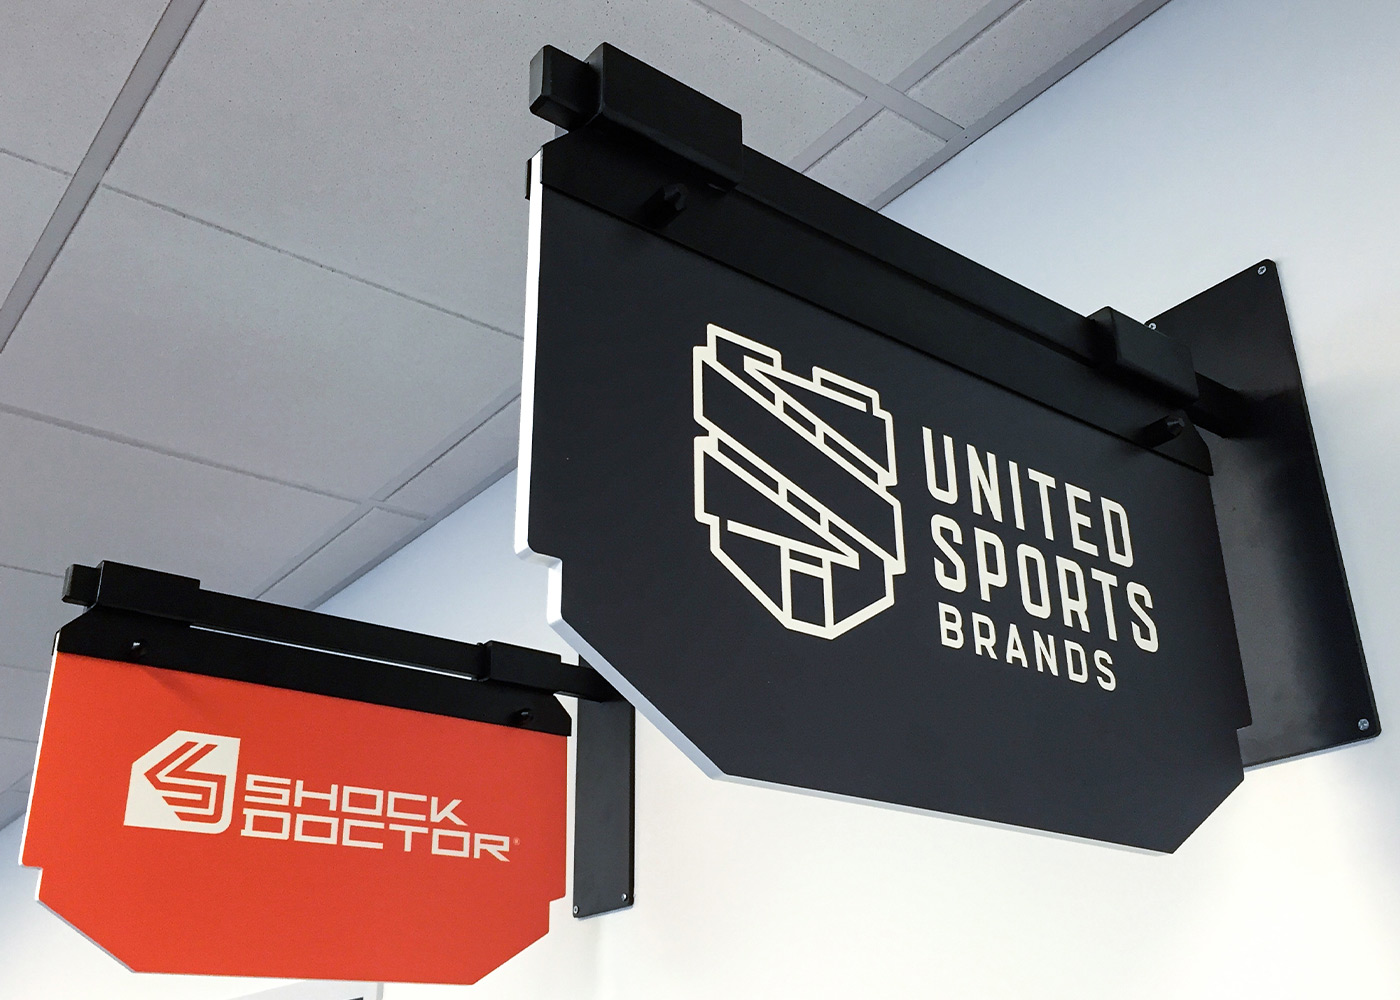 United Sports Brands Wayfinding